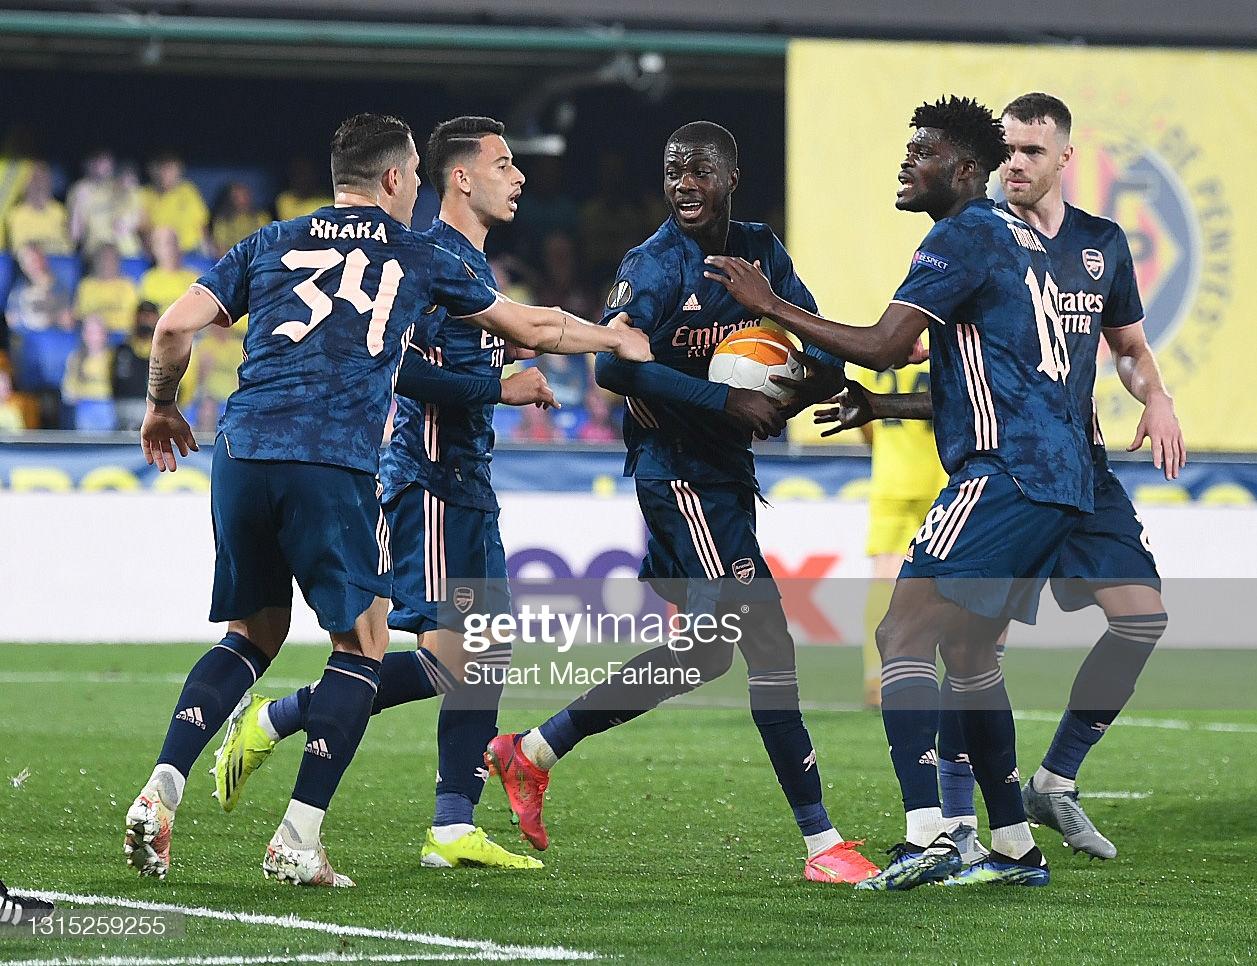 Arsenal vs Villarreal preview: Stats, team news, kick-off time